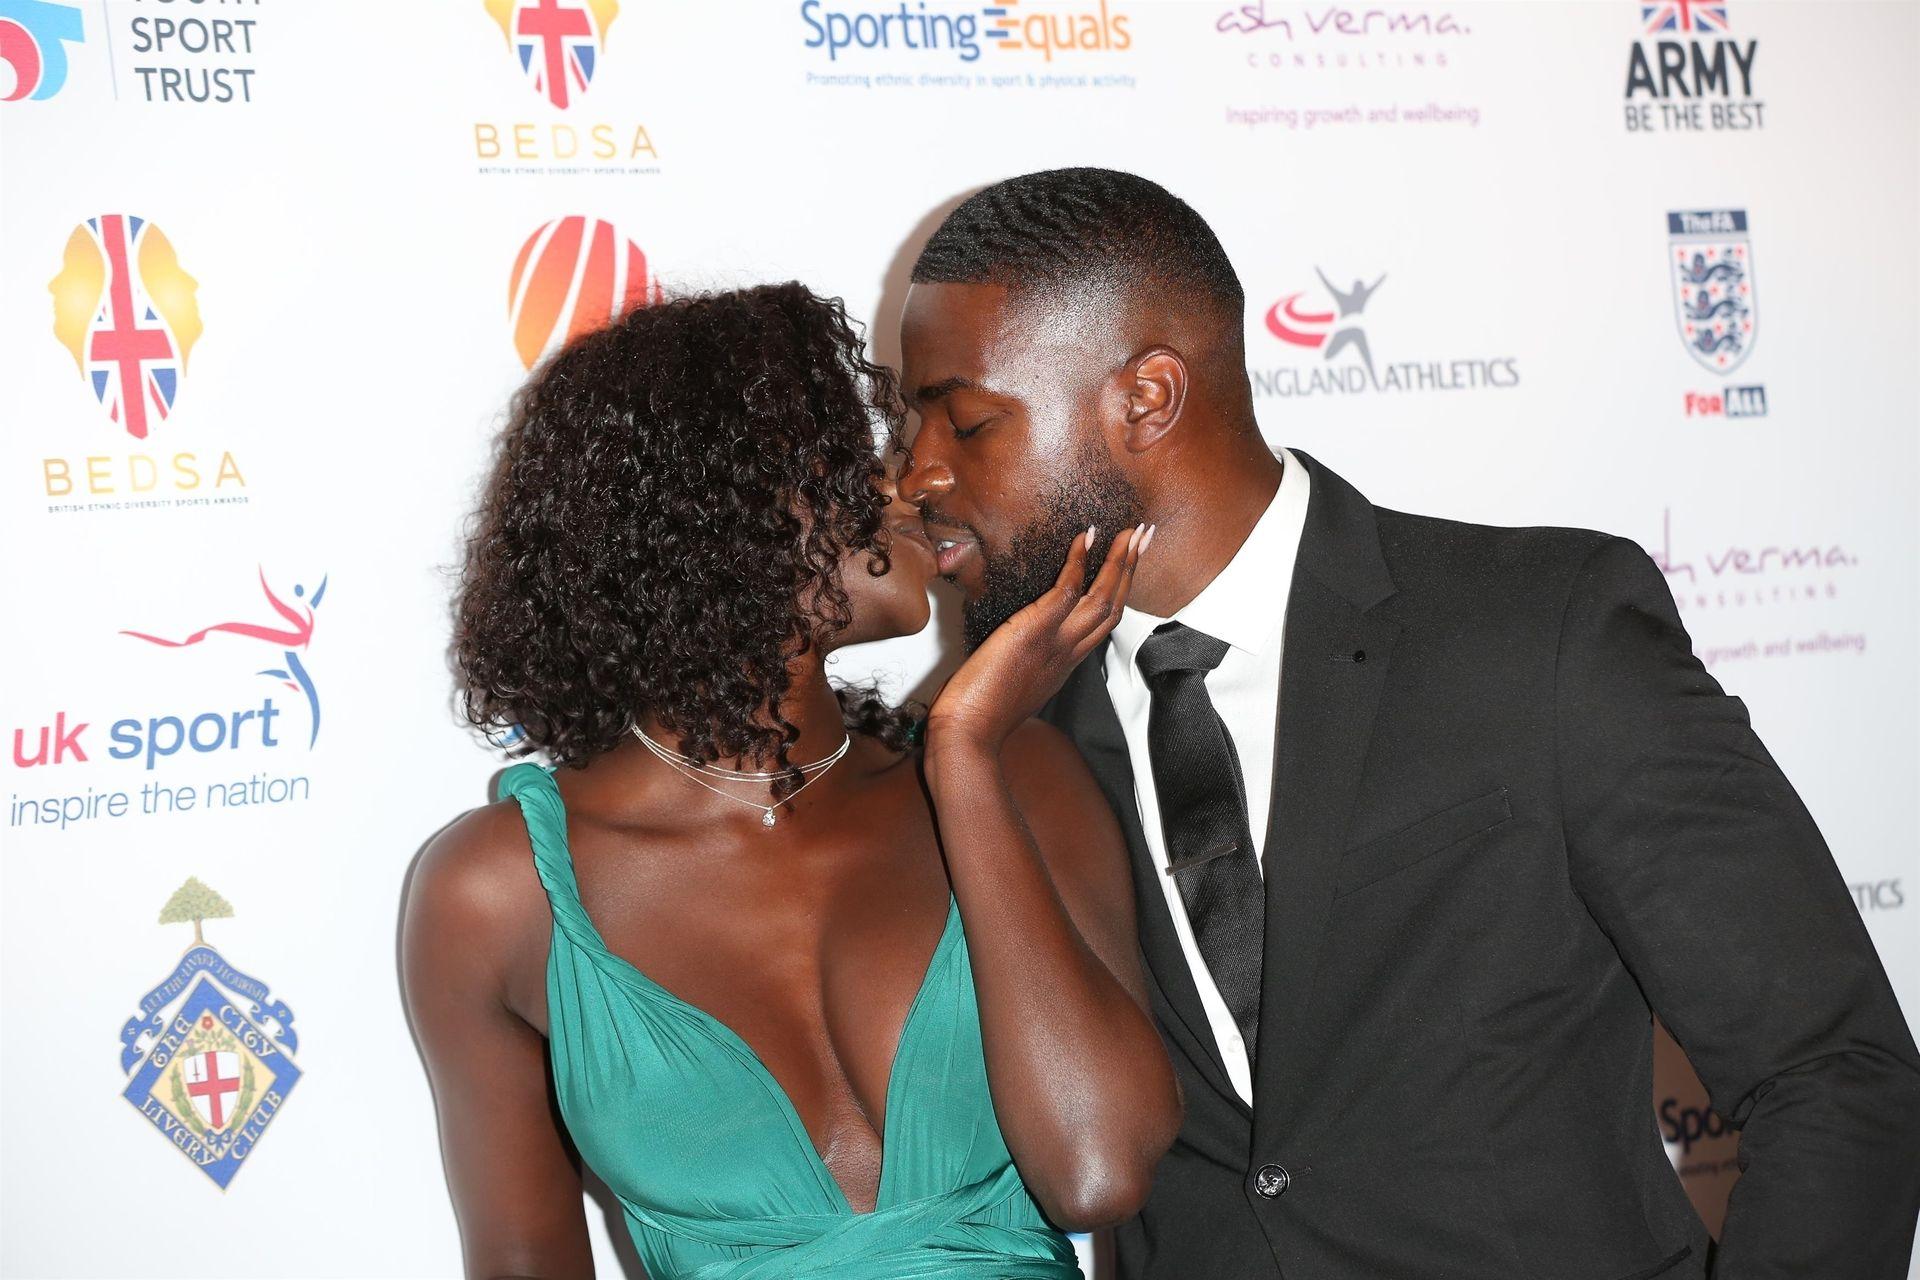 Mike Boateng & Priscilla Anyabu Are Seen At British Ethnic Diversity Sports Awards 0067